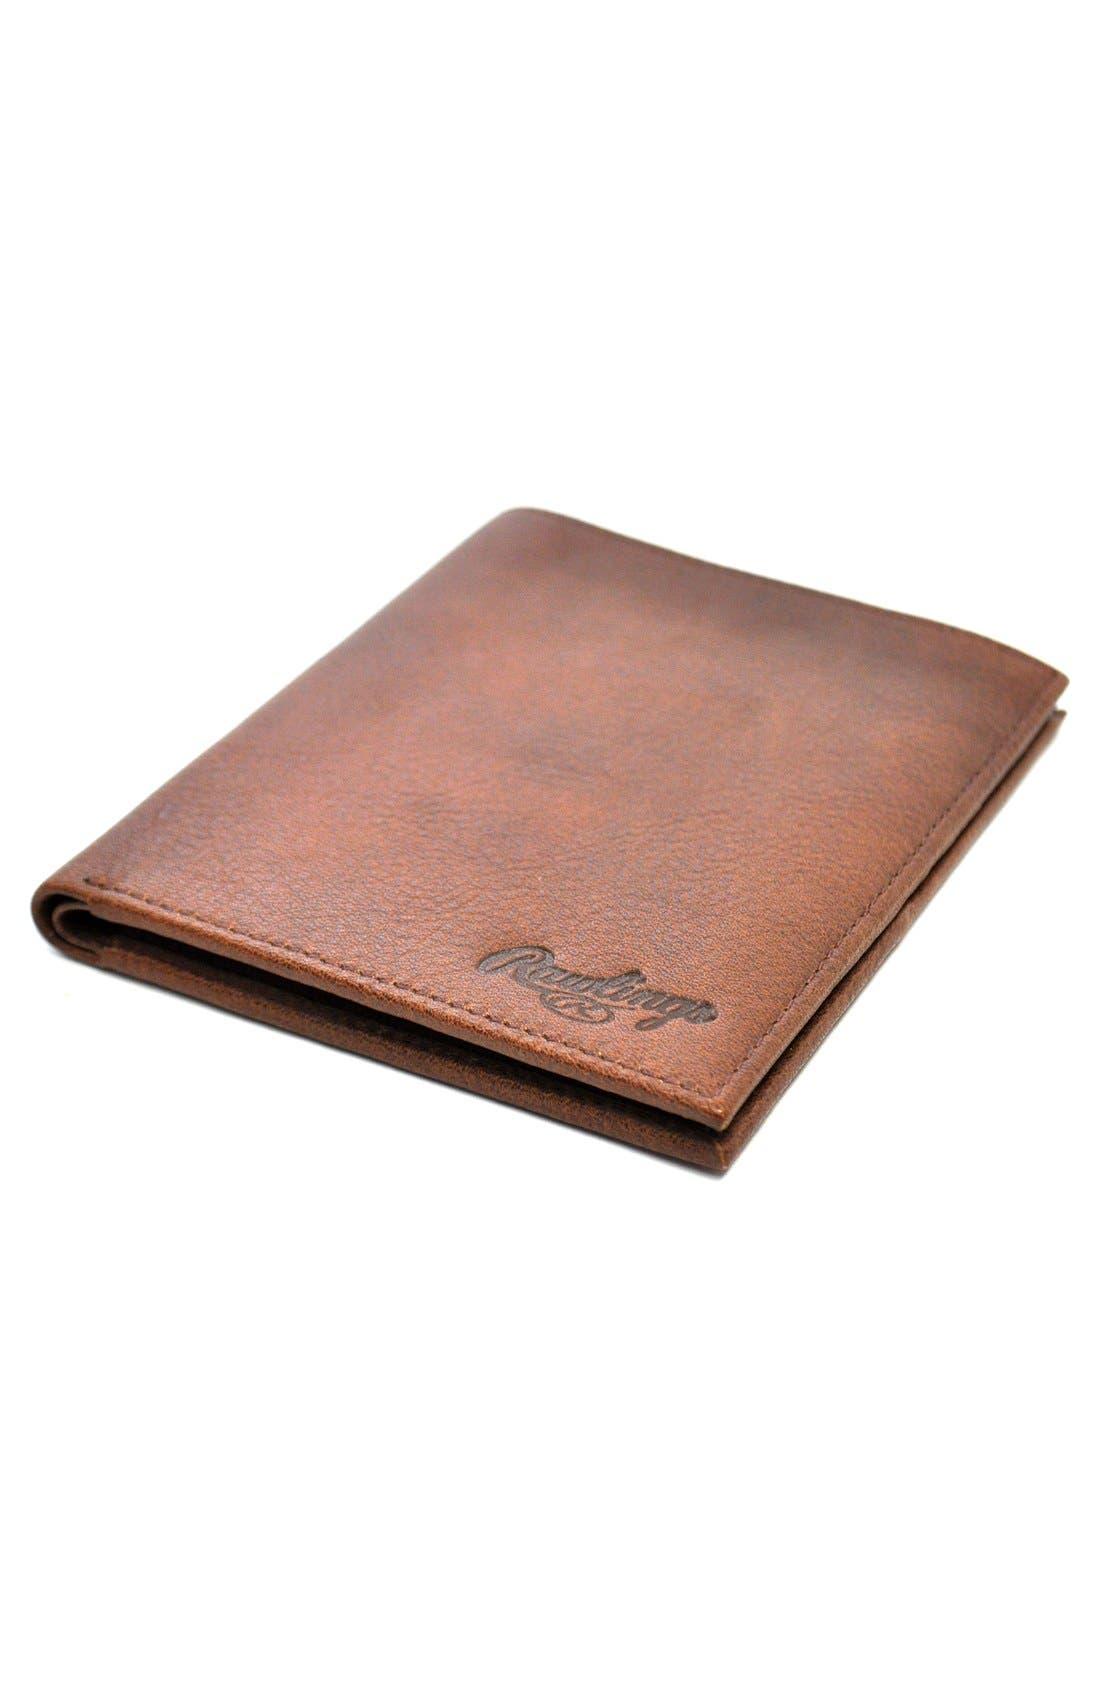 Triple Play Leather Executive Wallet,                             Alternate thumbnail 5, color,                             Cognac